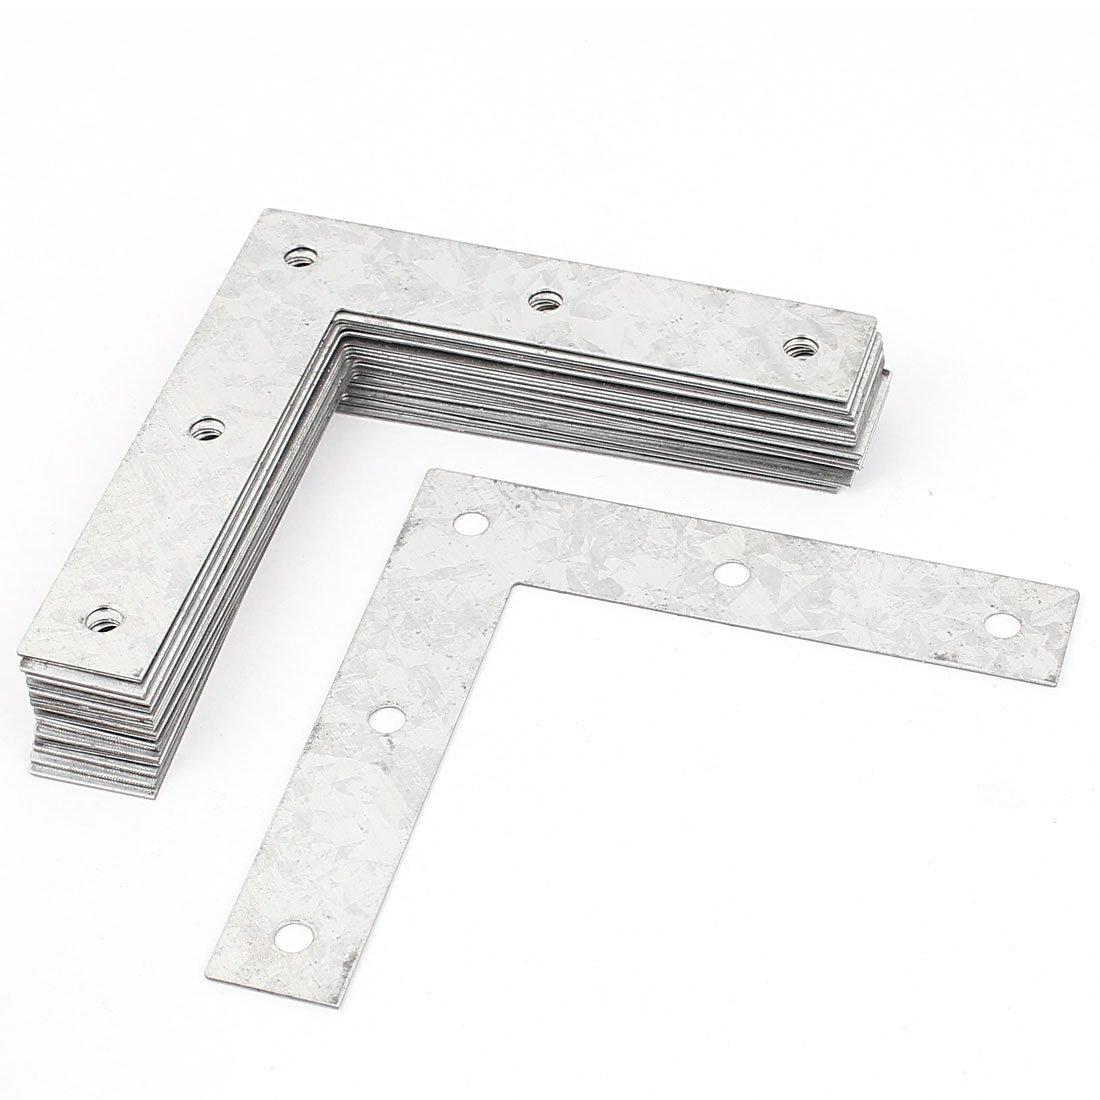 Flat Corner Braces L Shaped Metal Angle Brackets Plates 20pcs